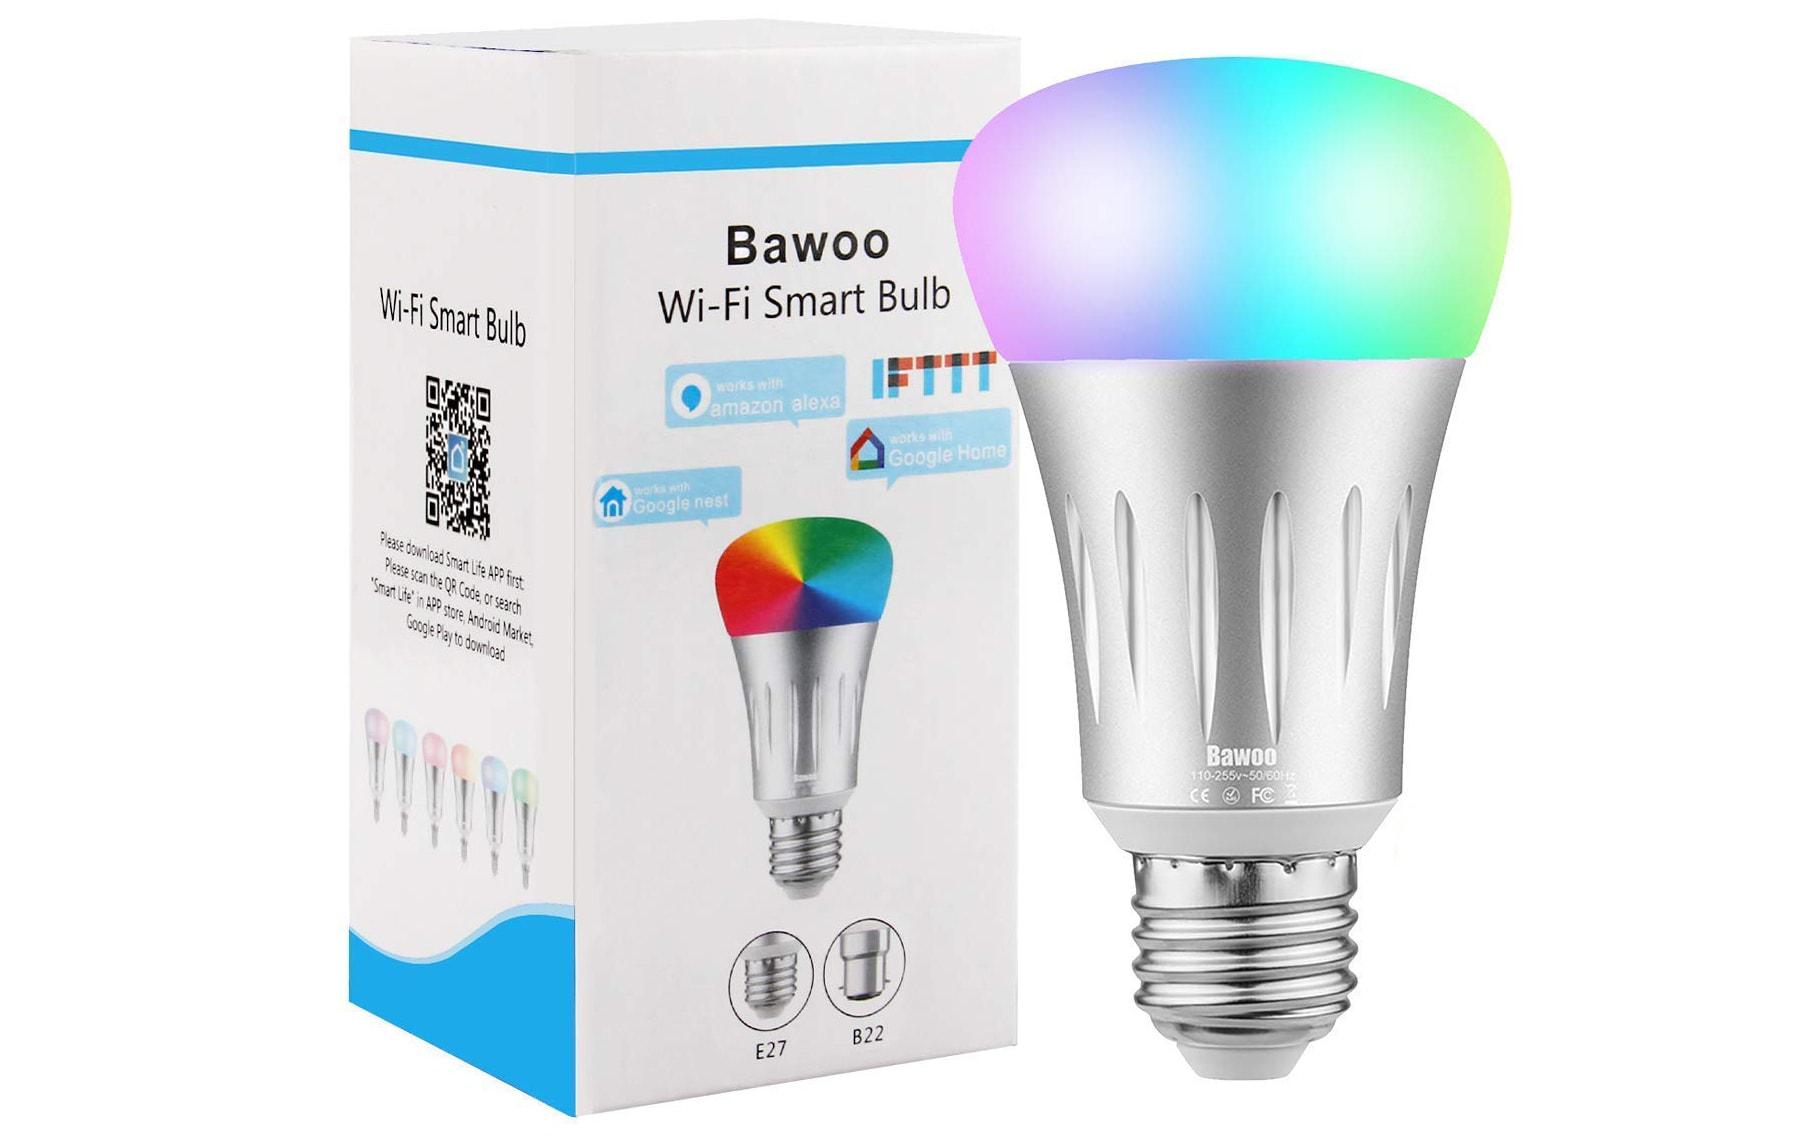 lampada intelligente Bawoo